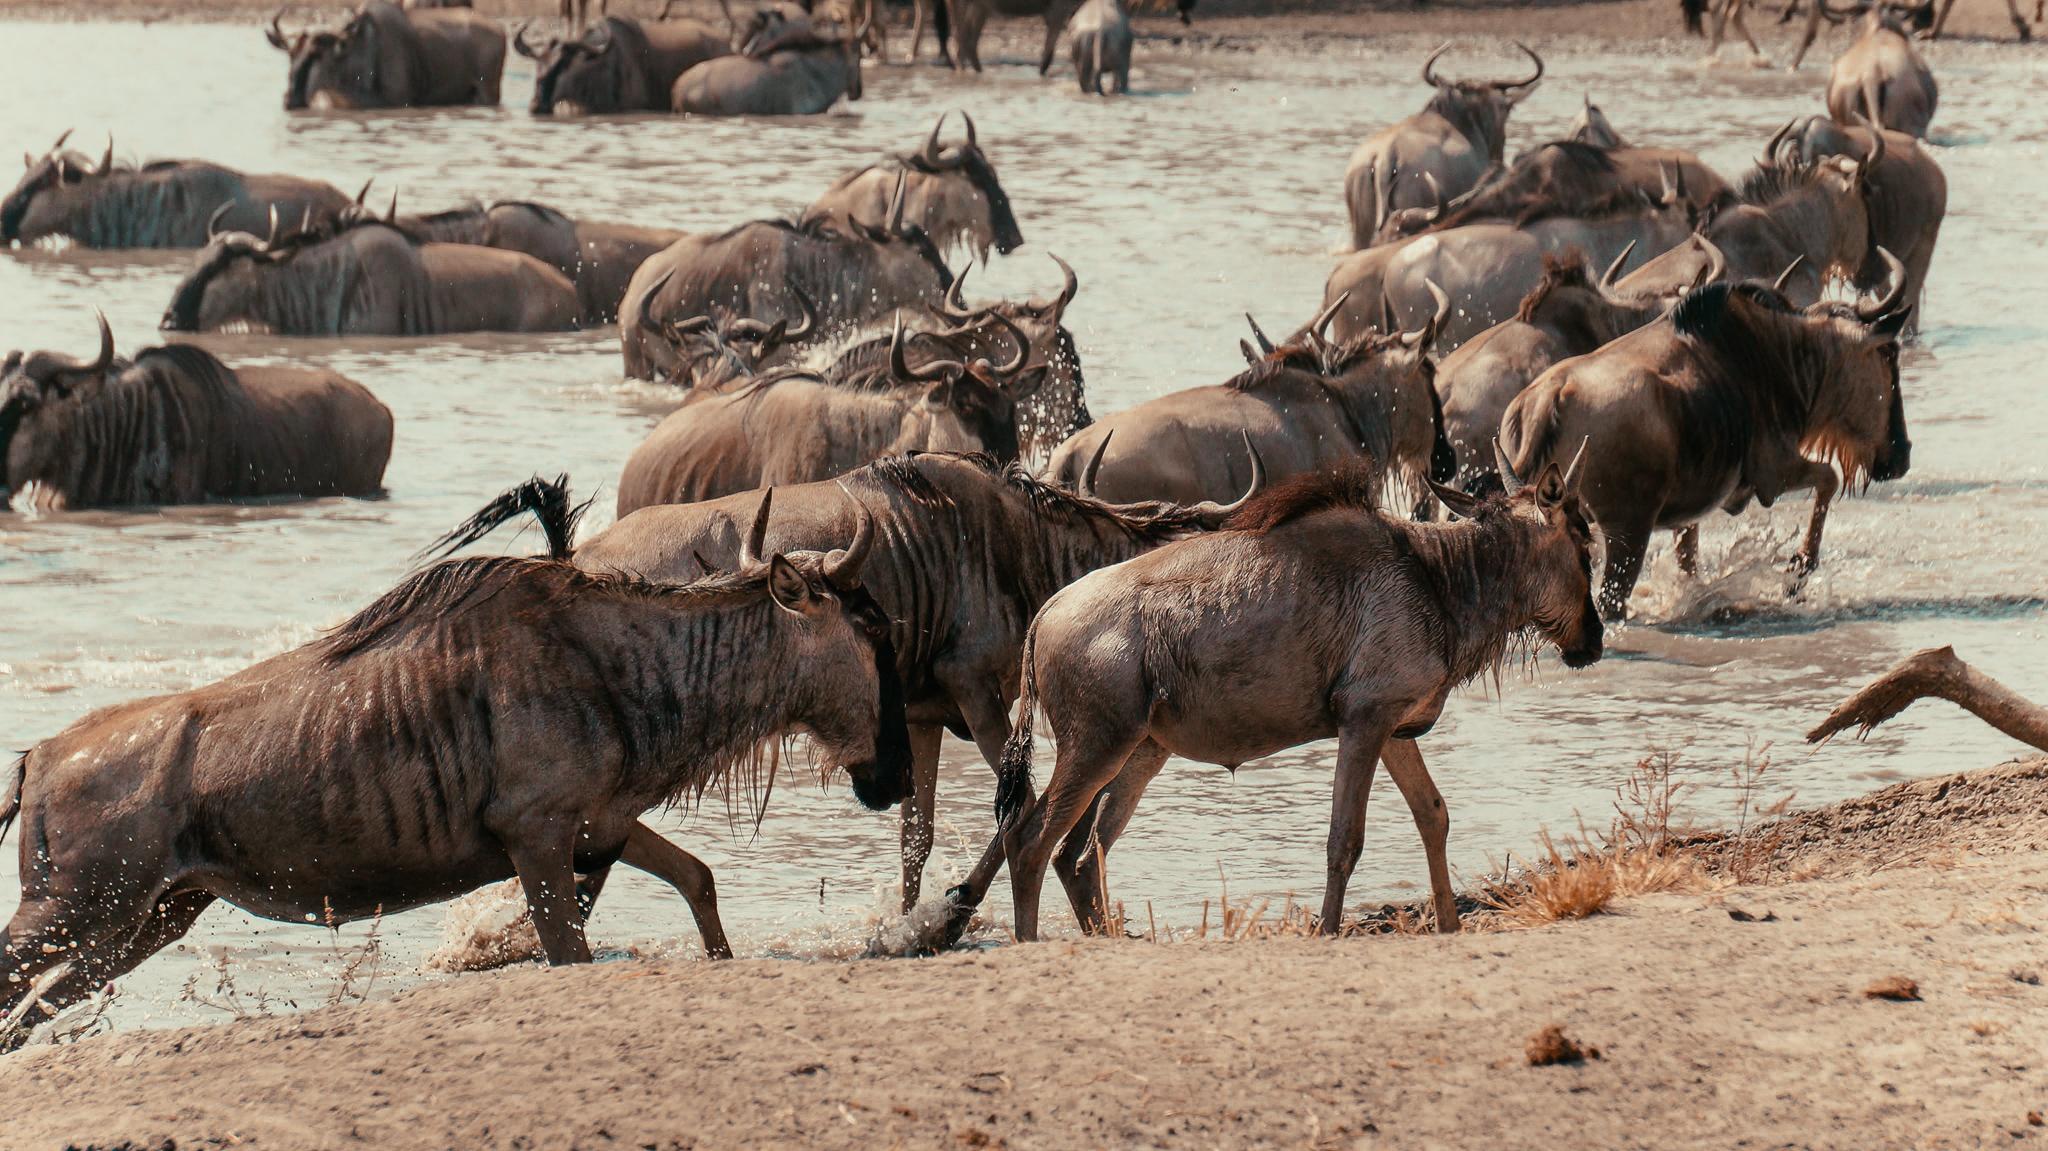 safari_159-3.jpg